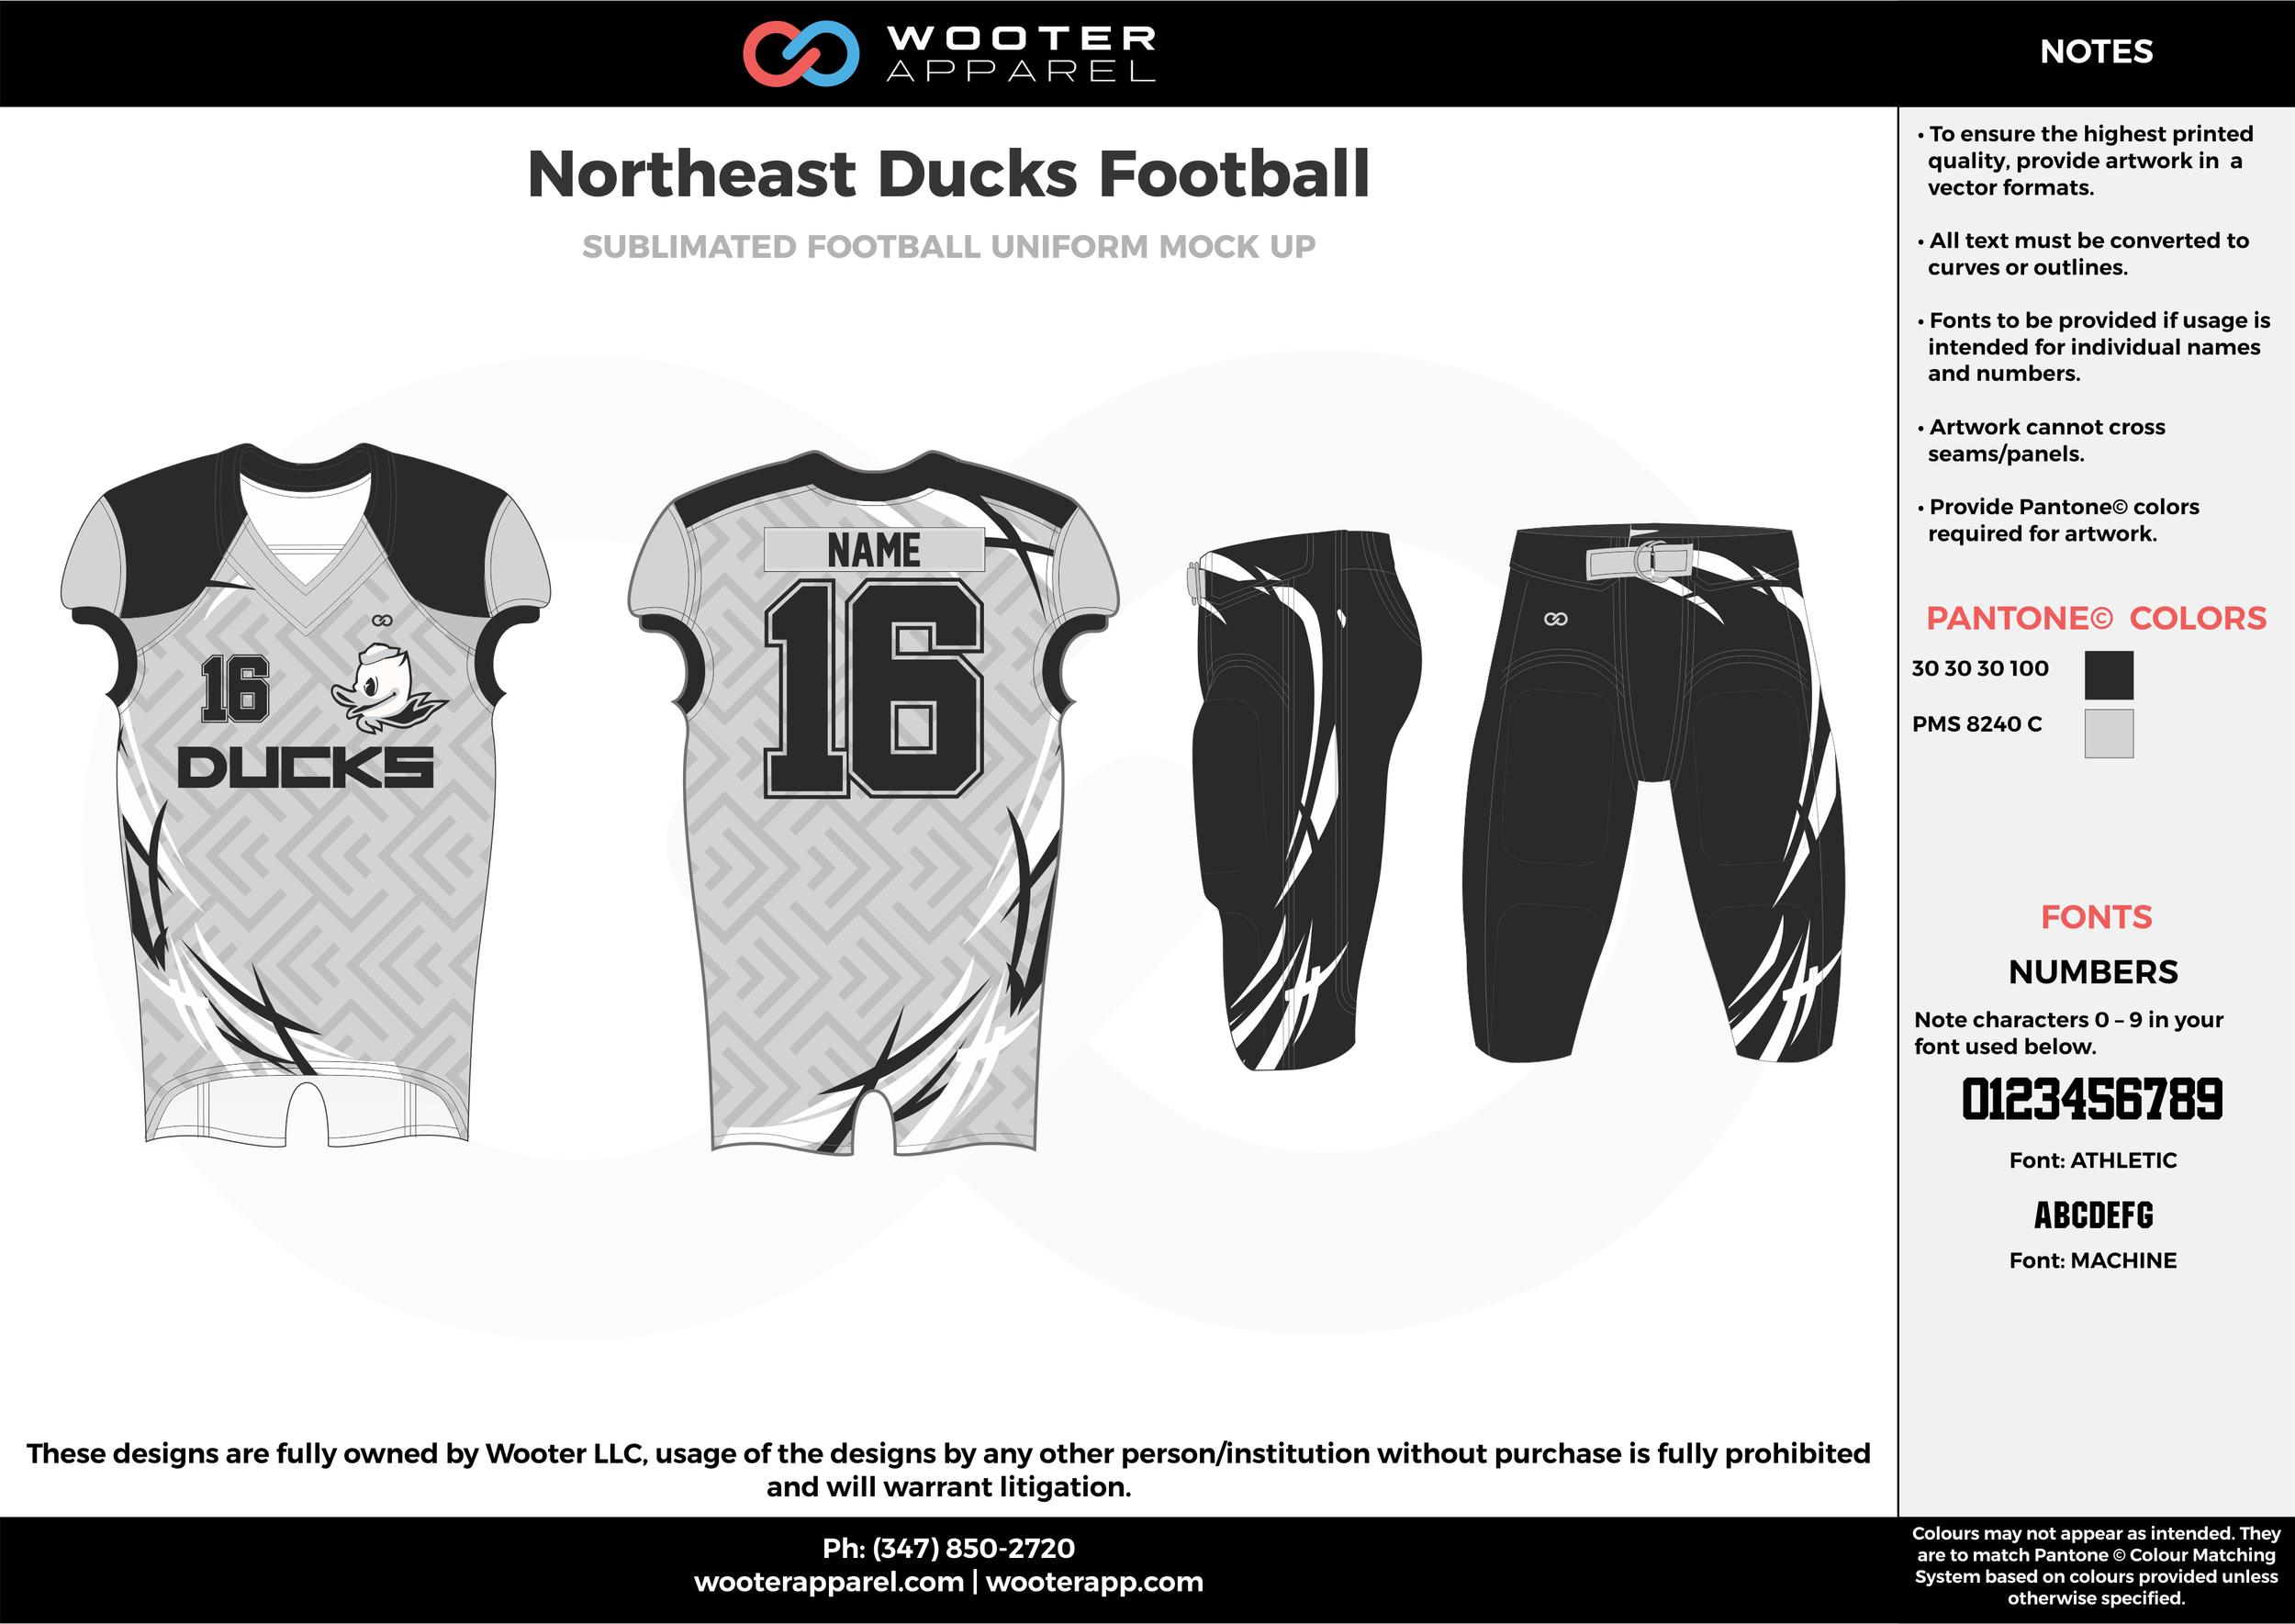 Northeast Ducks Football white black gray football uniforms jerseys pants